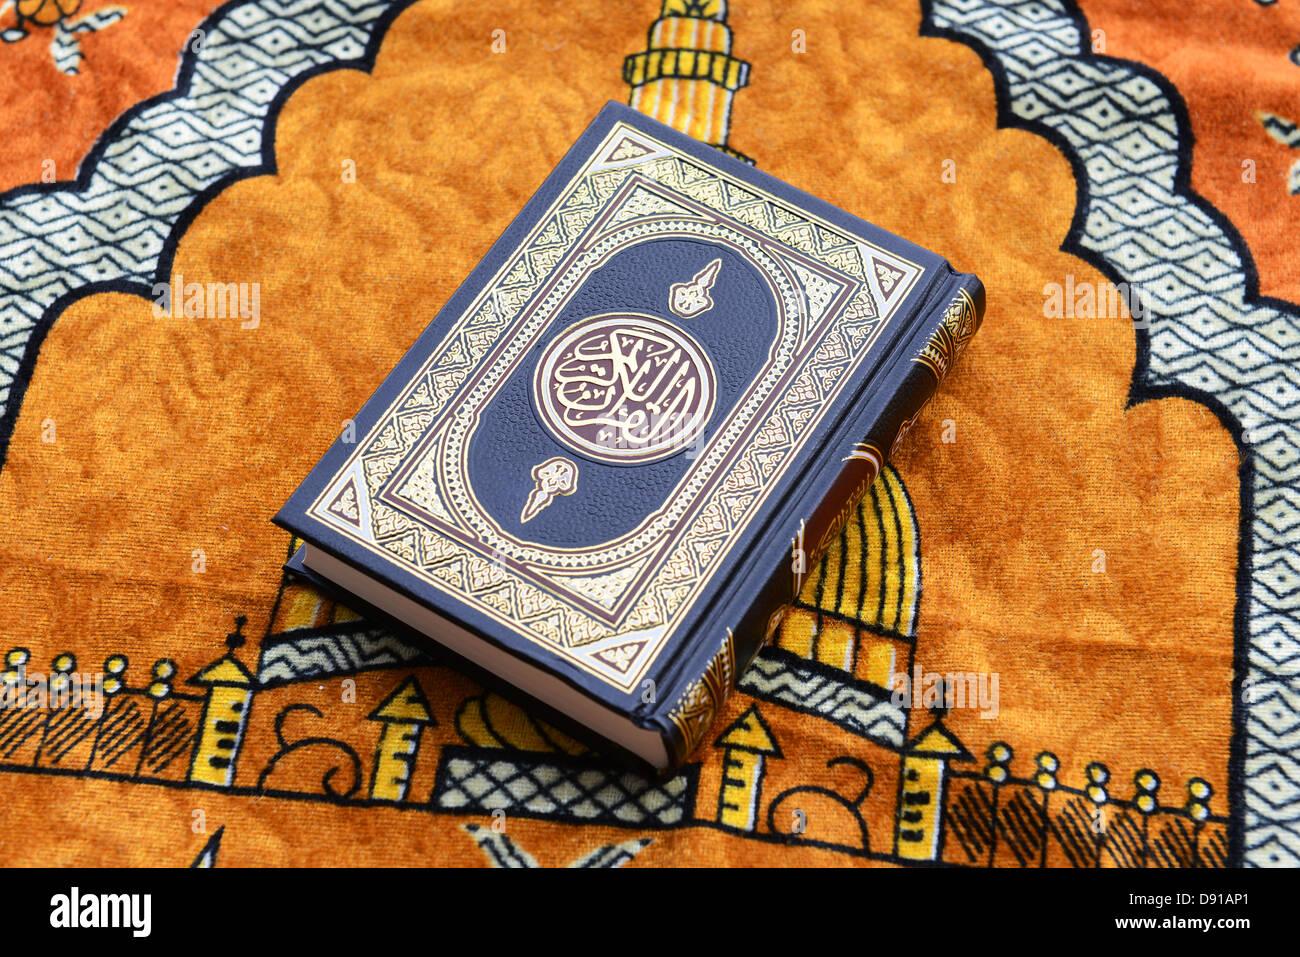 Koran, Quran, Qur'an, Holy Koran book, Quran religious text, Islamic literature Koran on a prayer rug - Stock Image